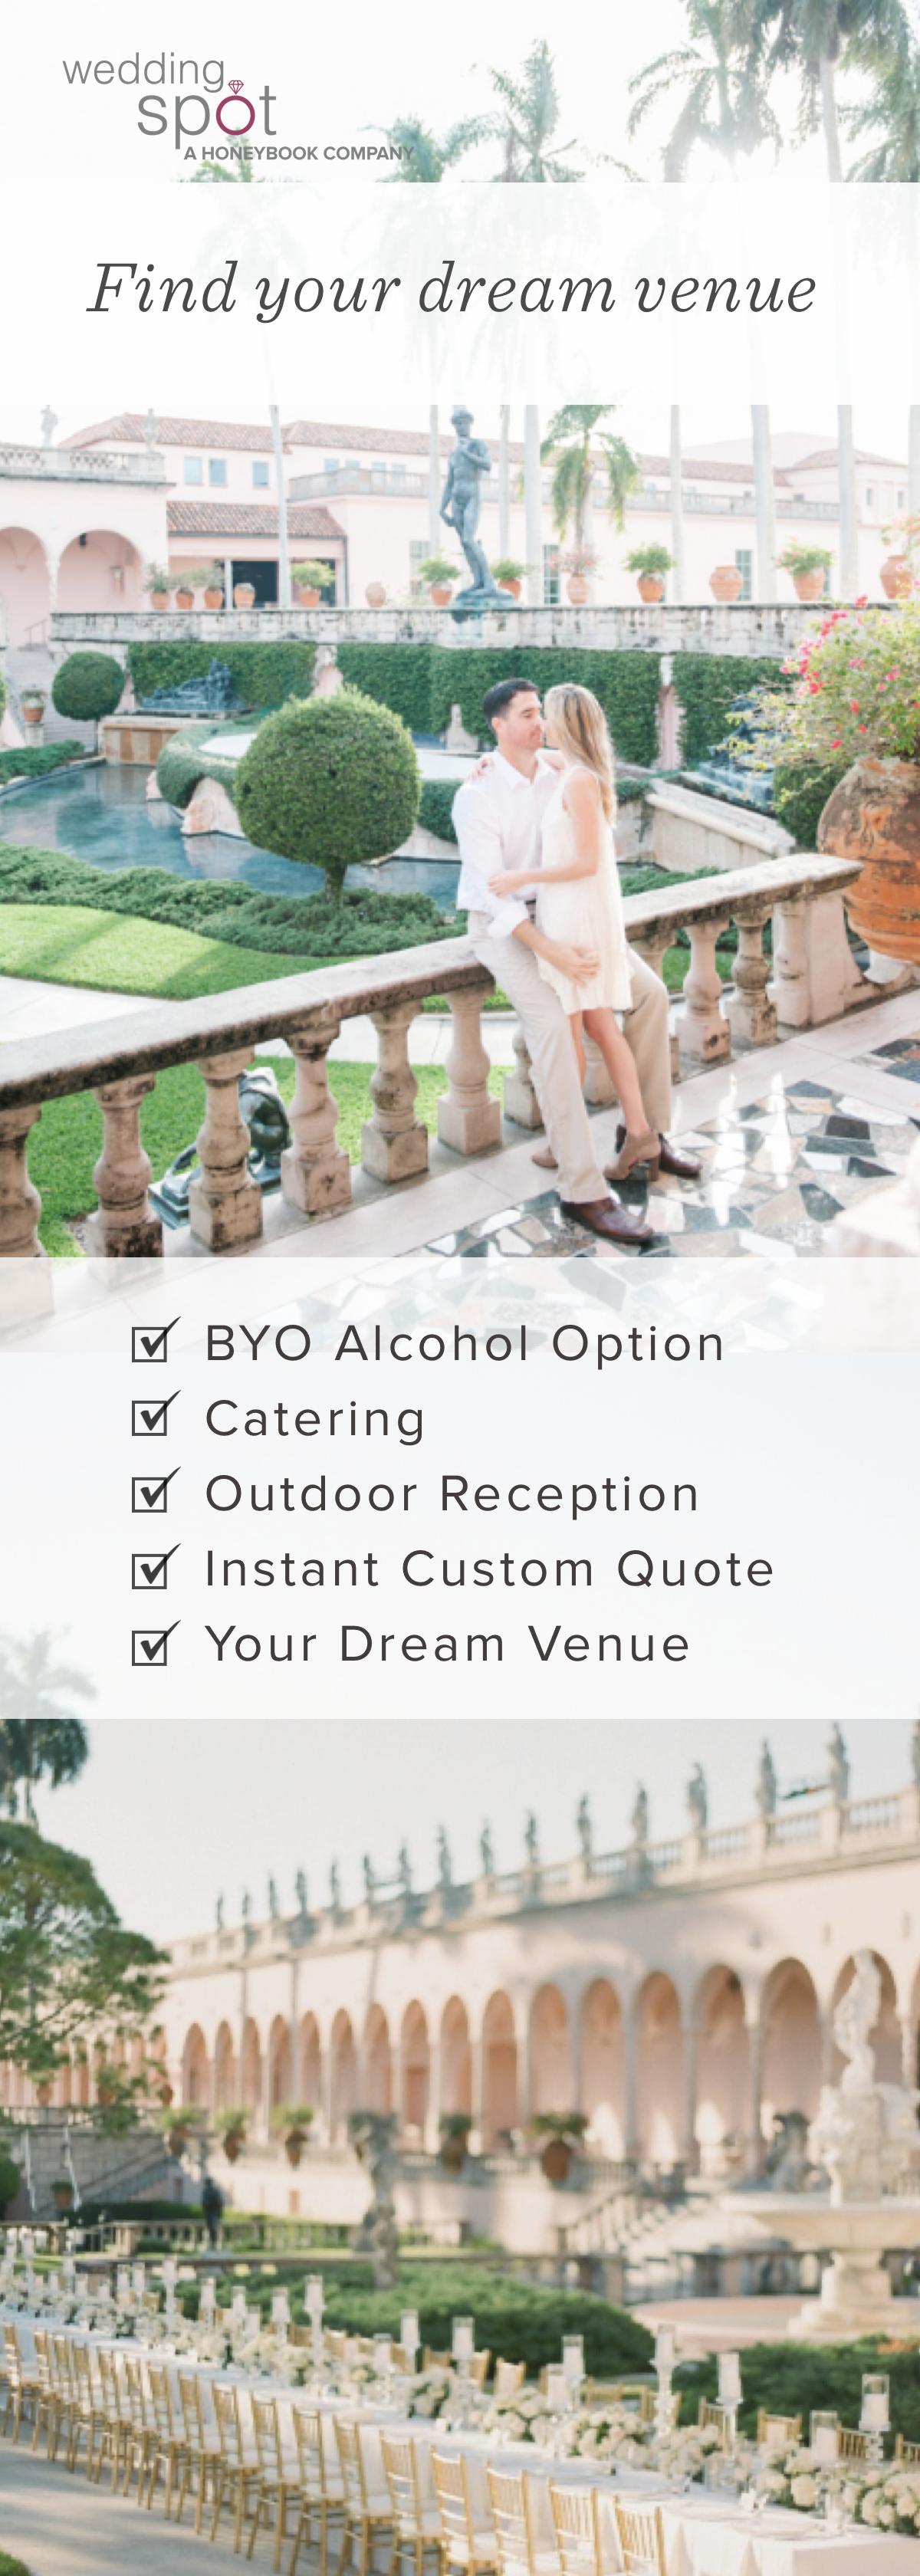 5 affordable wedding venues in central florida wedding venues